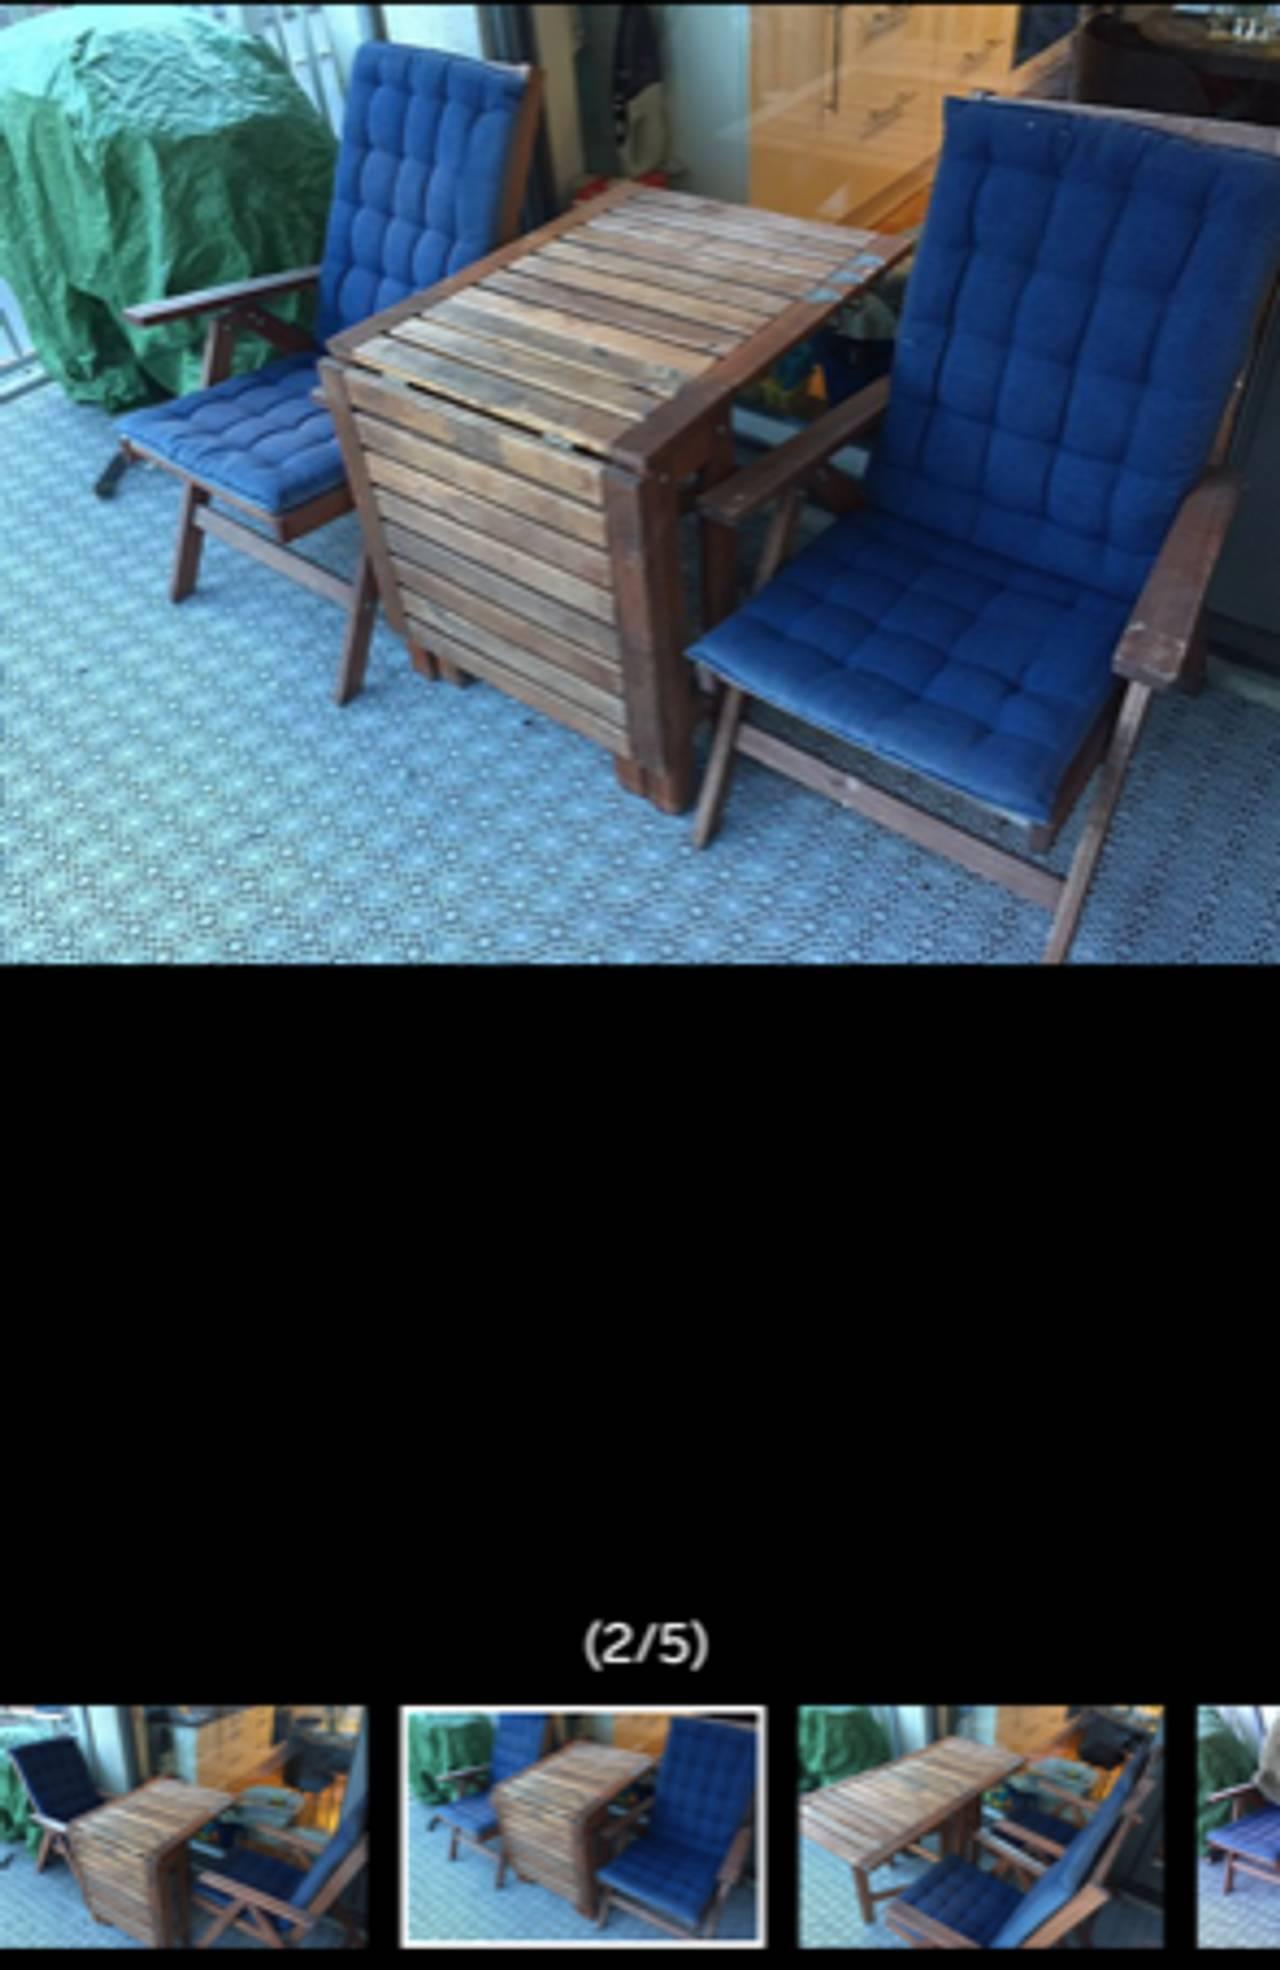 Brune hagemøbler med blå puter på en veranda.